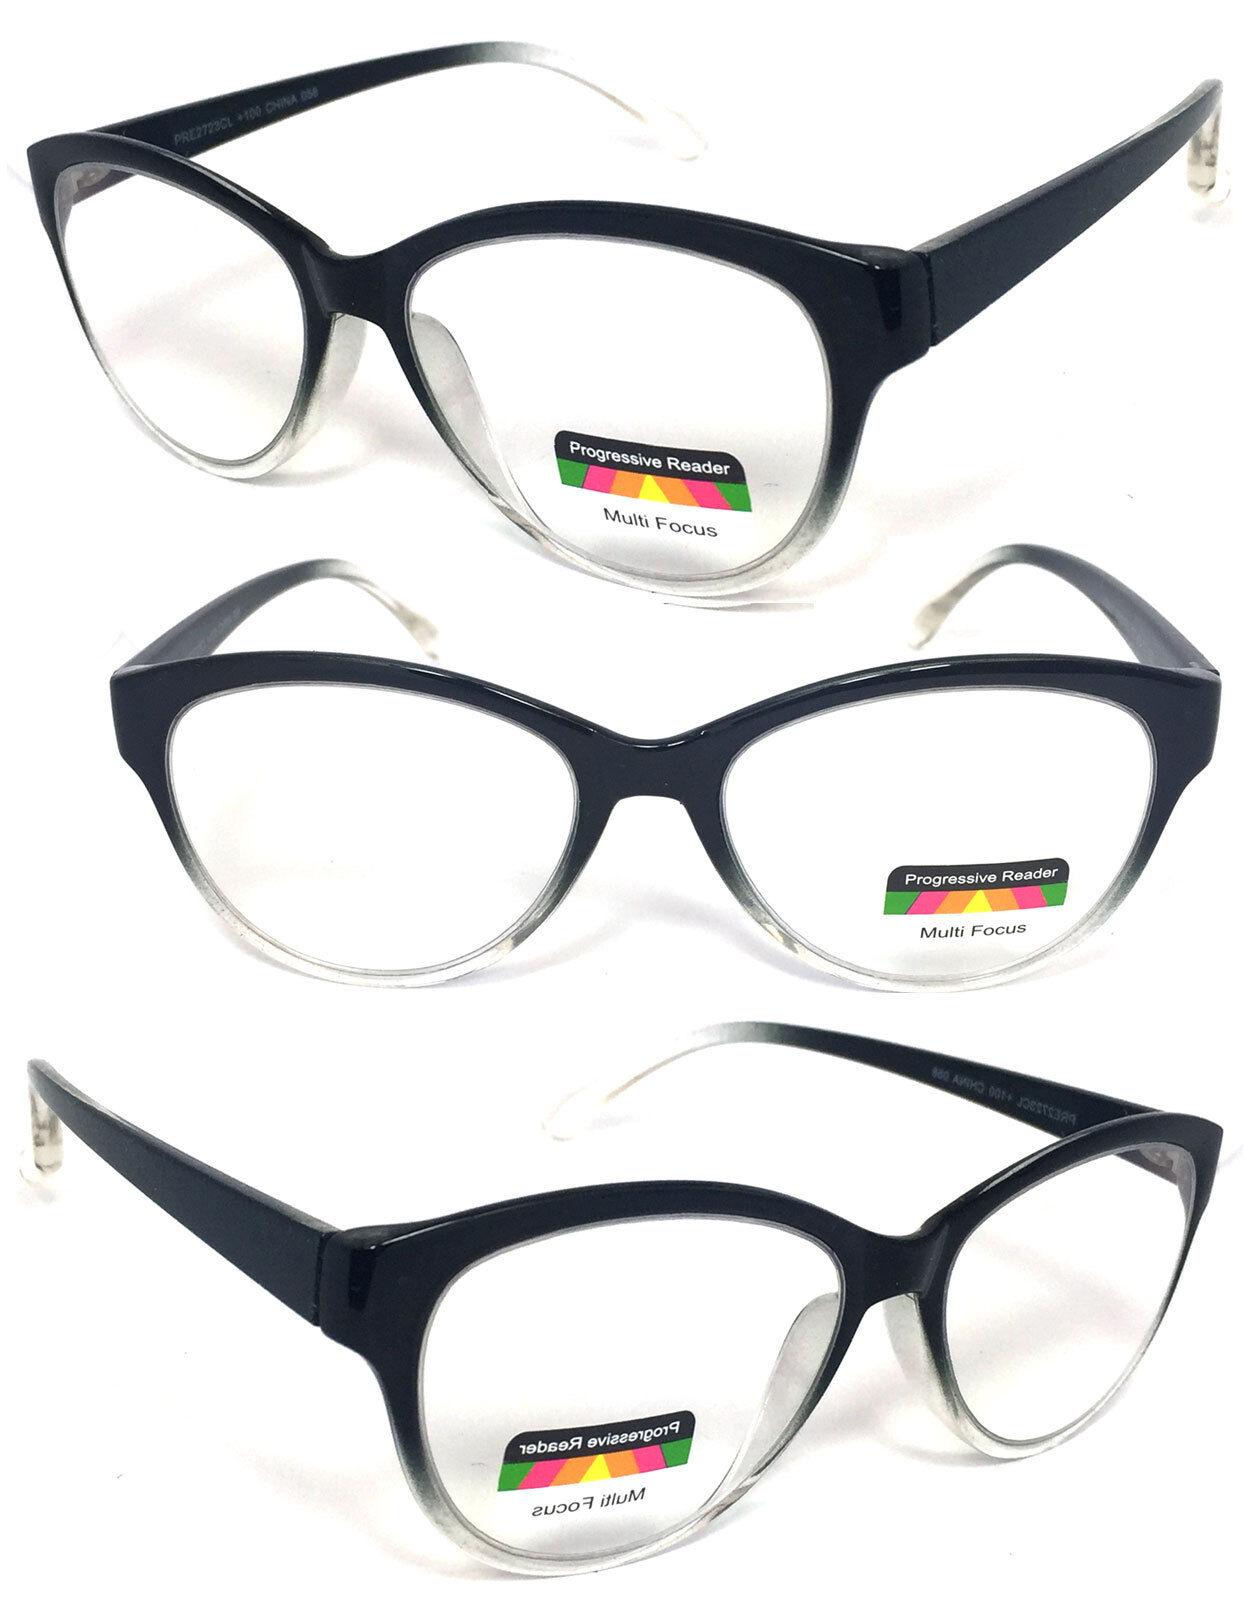 2bcec7646ec Details about Cat Eye Multi Focus +Reading Glasses Clear Lens 3 Strengths  in 1 Reader